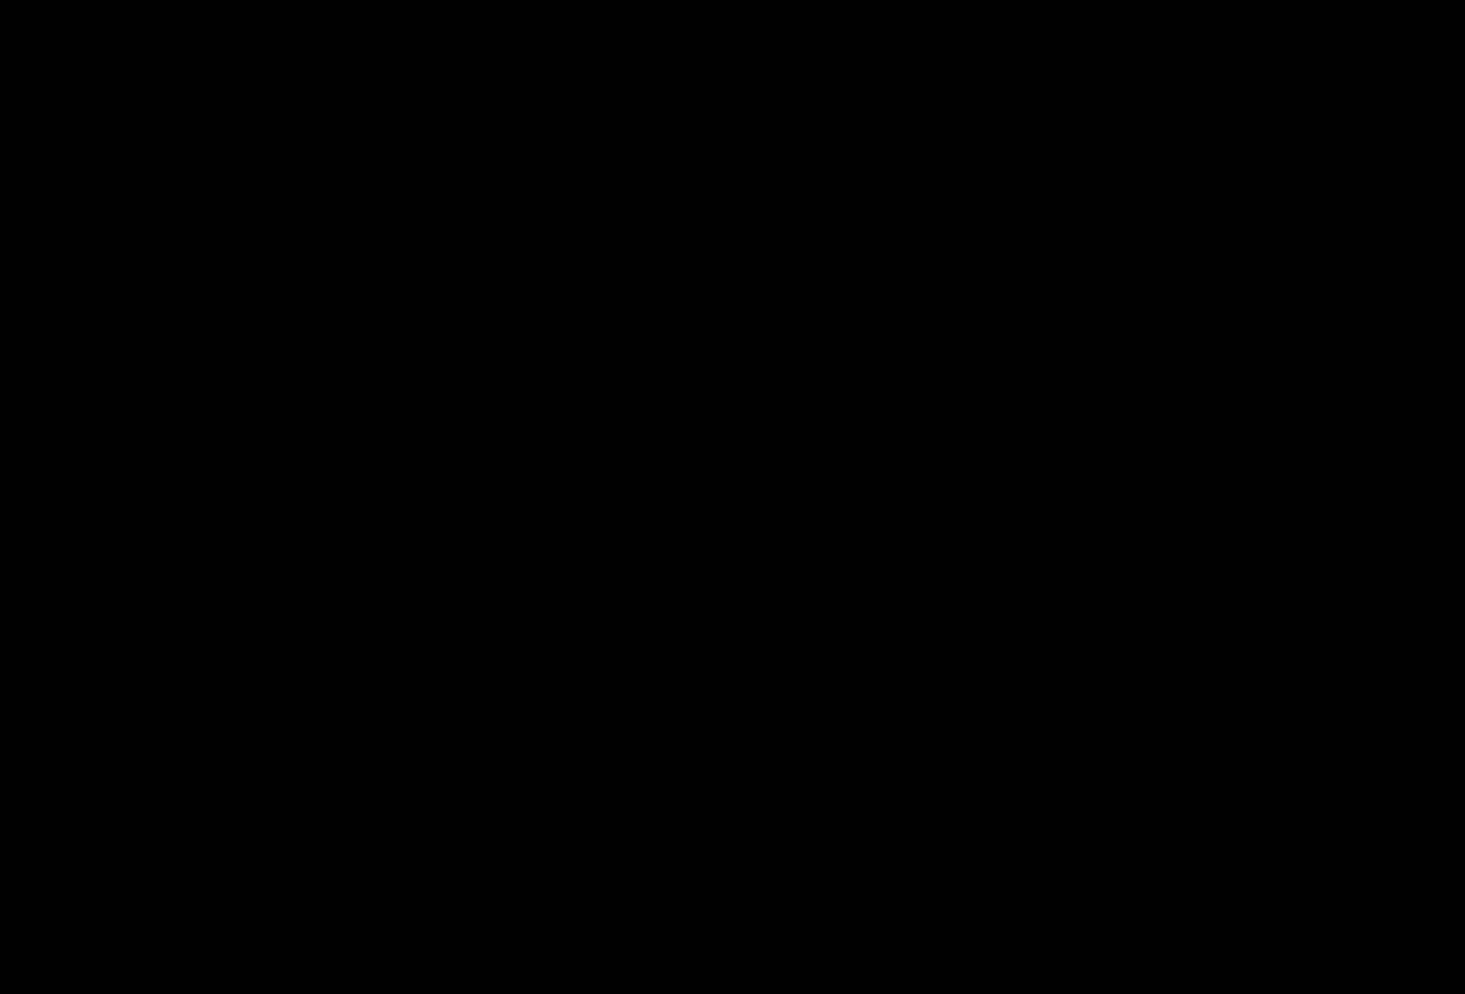 RADLY_regular_logo